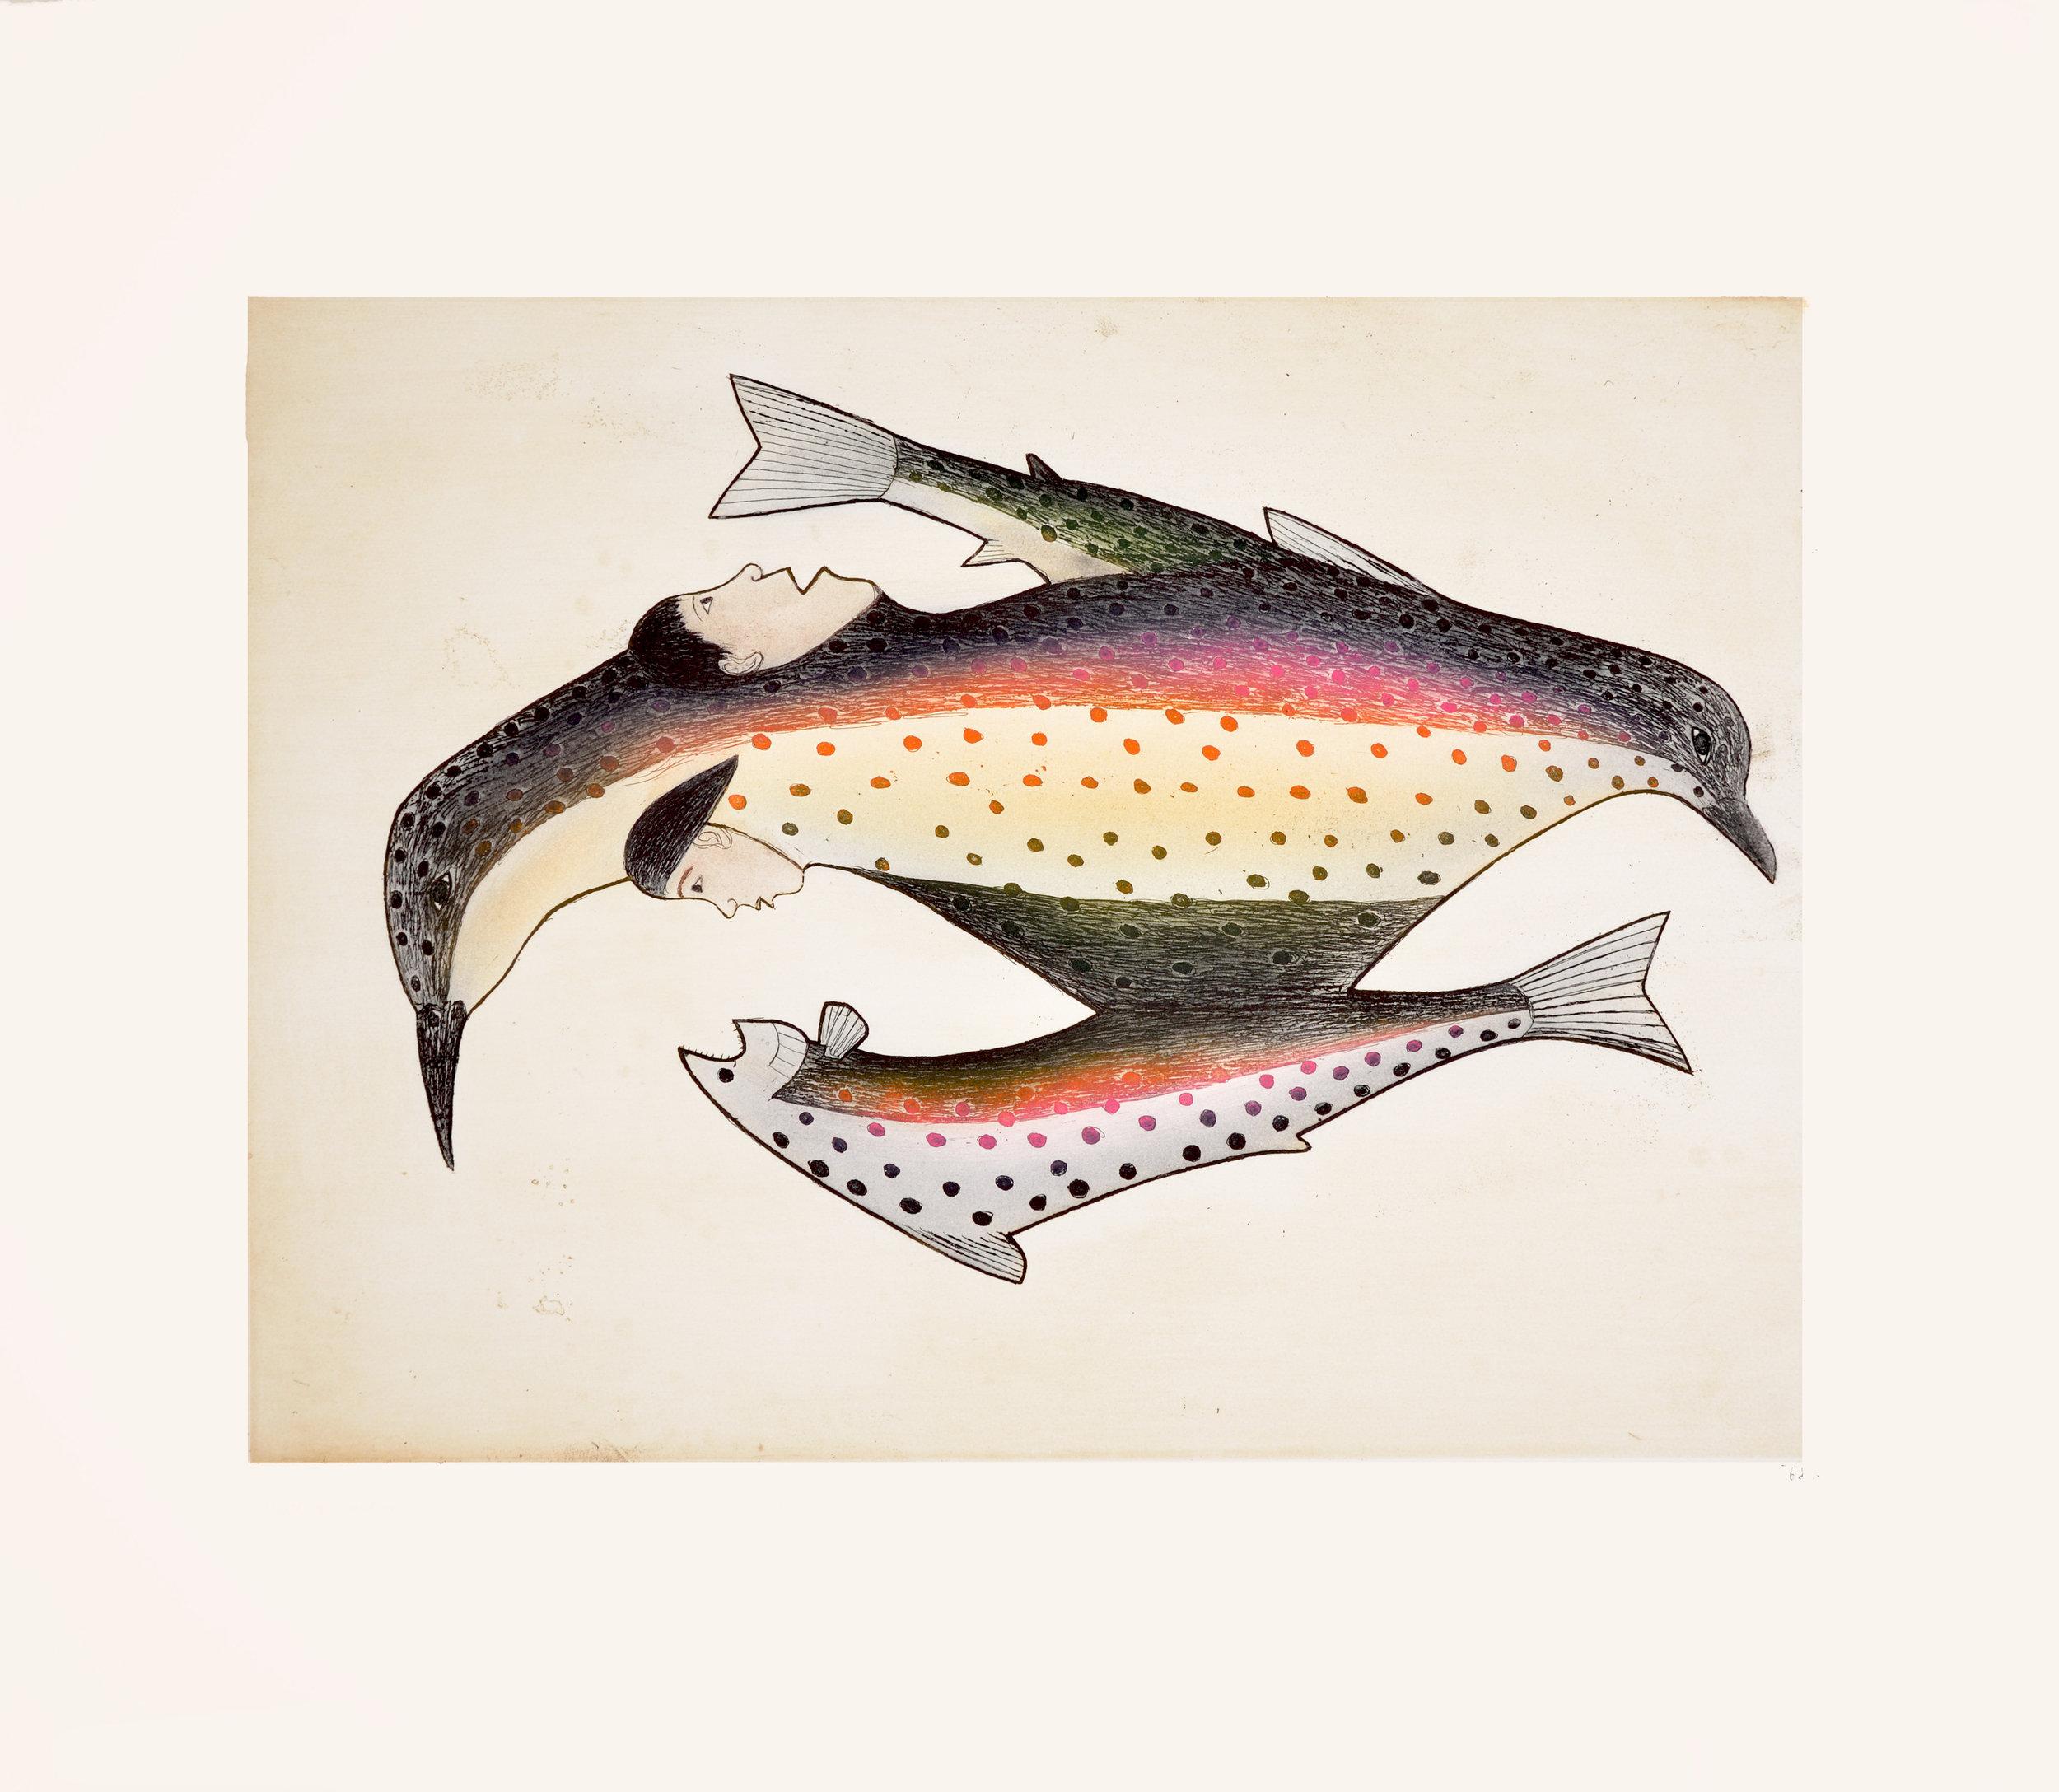 Kakulu Saggiaktok  MYTH OF CREATION Etching & Aquatint 2000 68.5 x 80 cm $500.00 CDN Released in the 2000 collection Dorset ID#: 00-03